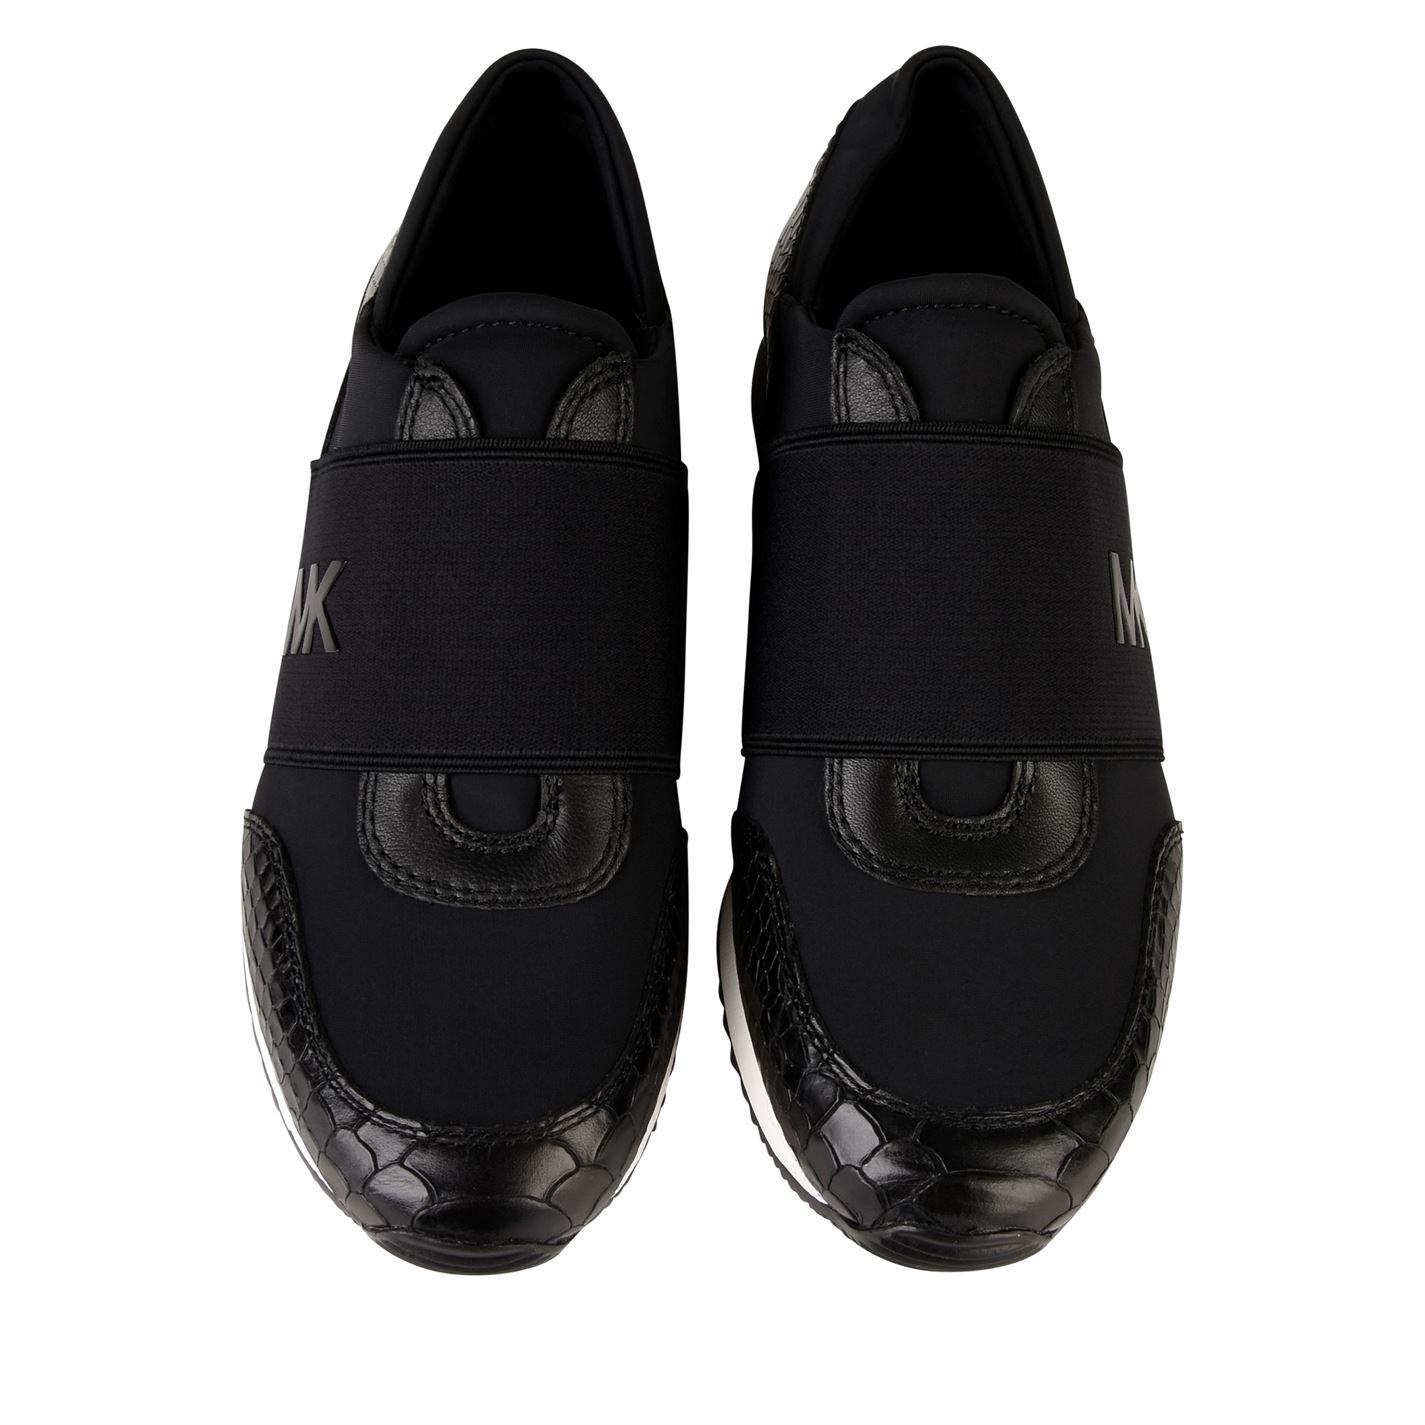 michael kors black glitter trainers